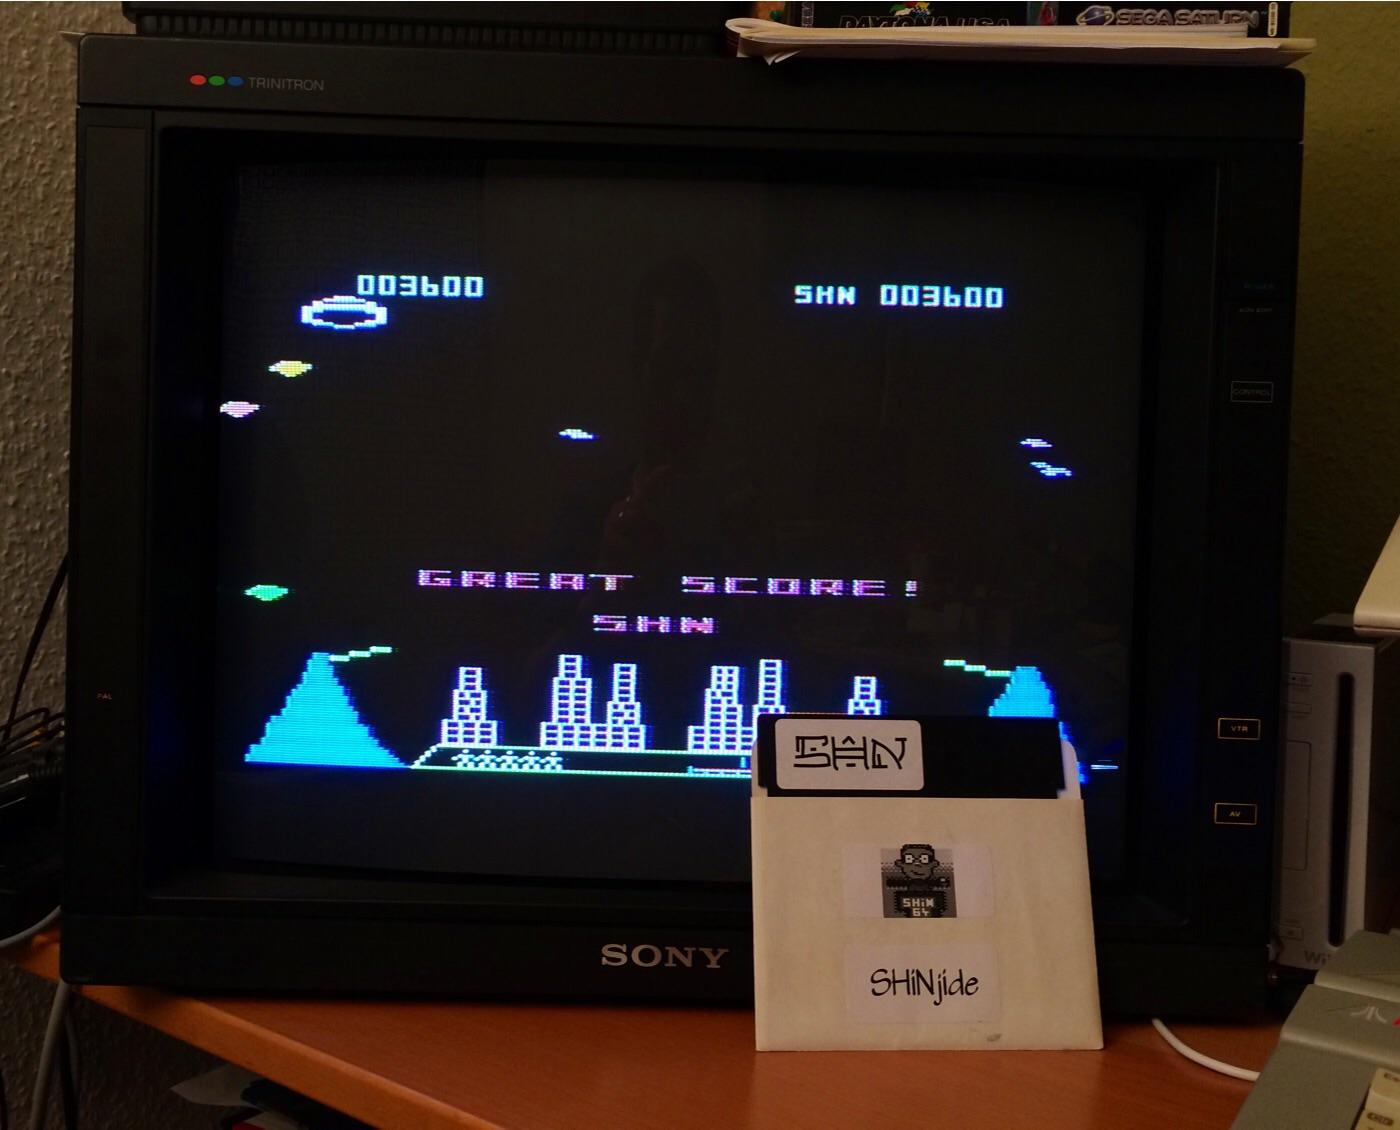 SHiNjide: Meteor Storm (Atari 400/800/XL/XE) 3,600 points on 2015-01-09 11:09:19